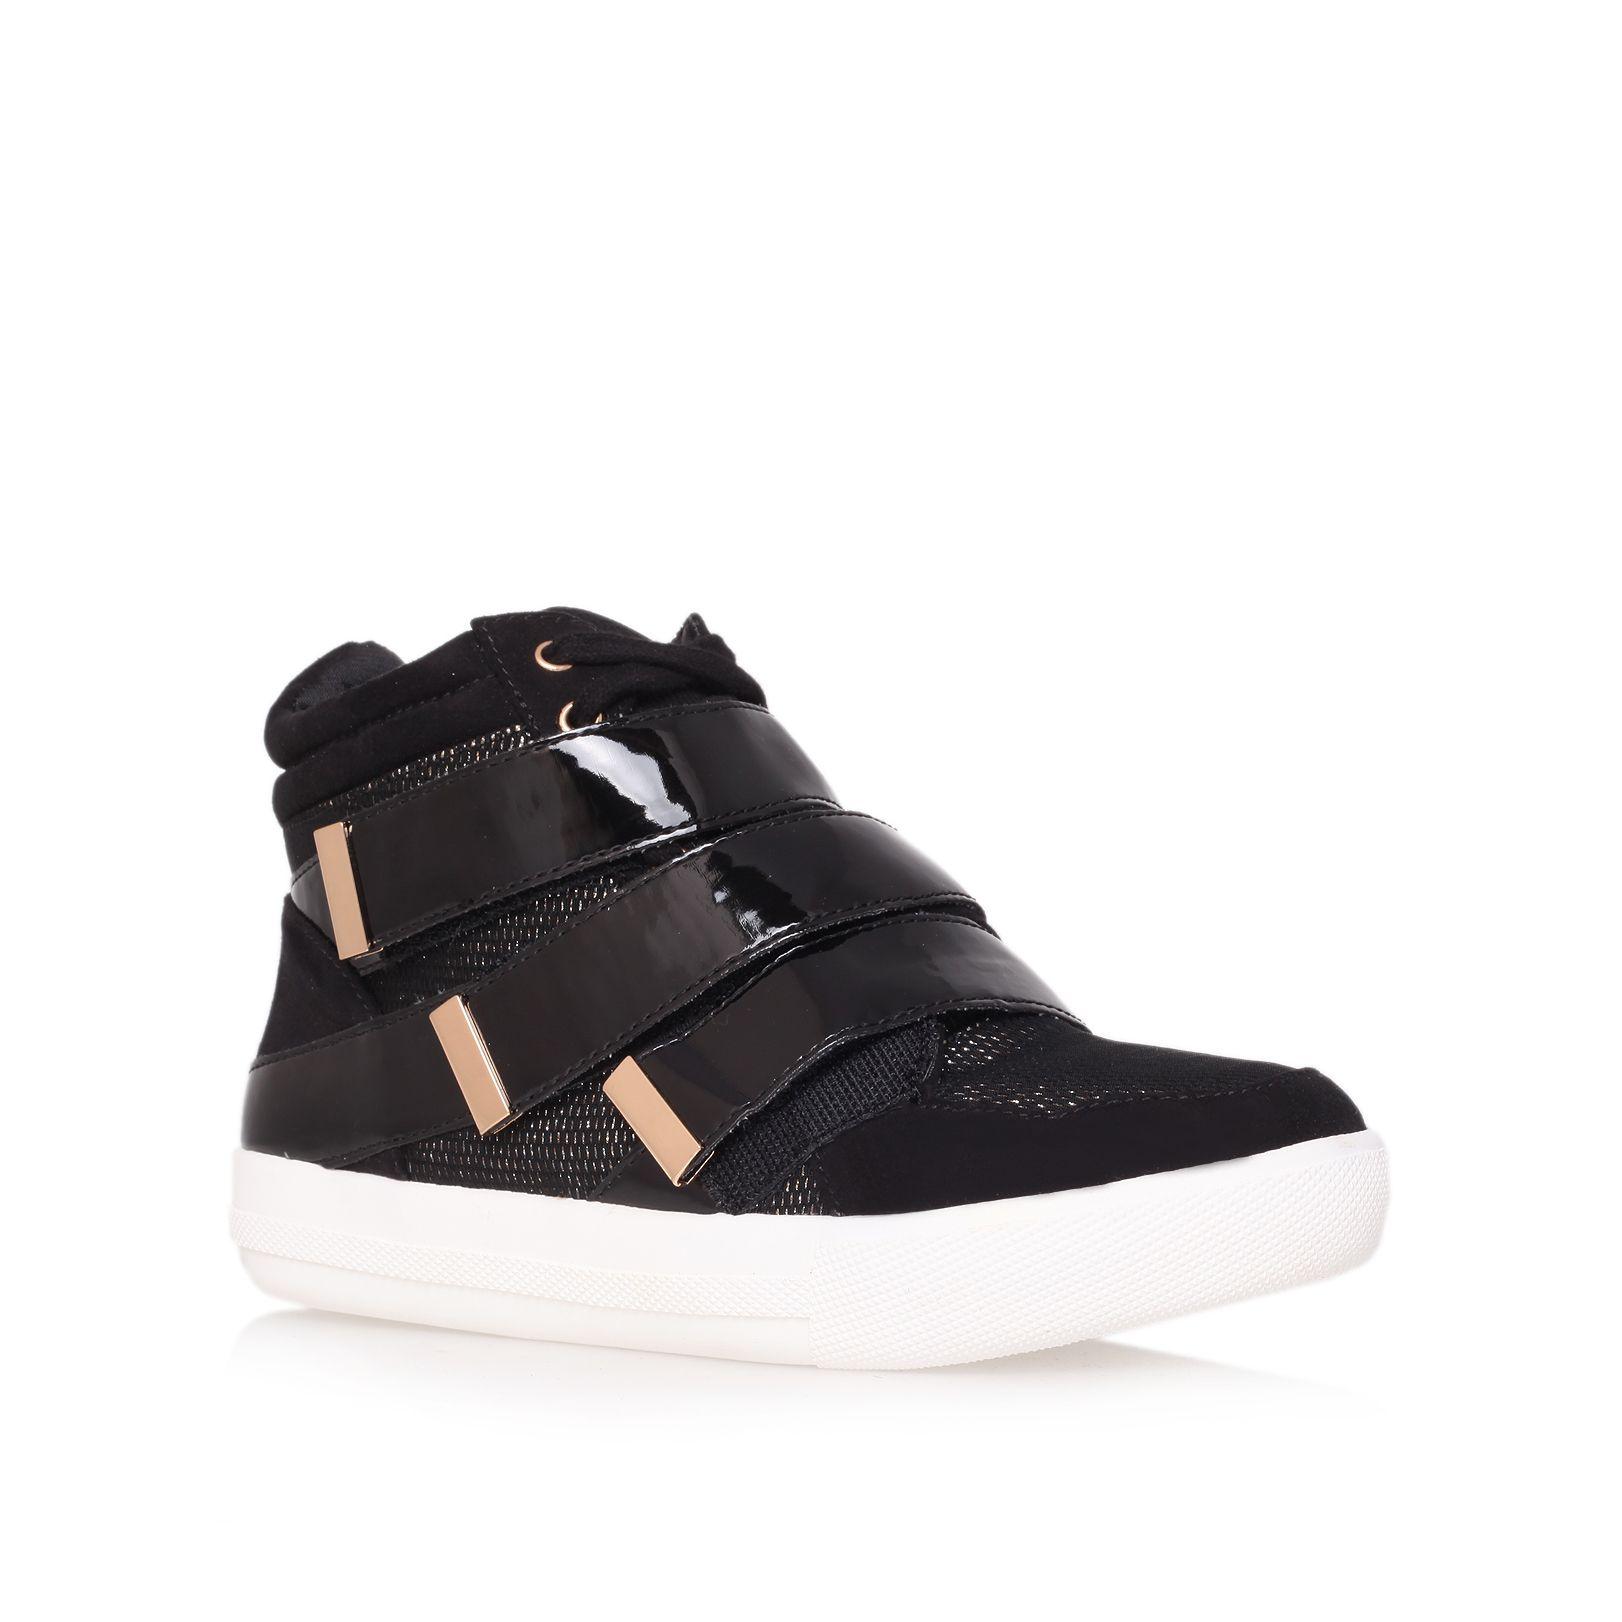 Carvela Kurt Geiger Listen Trainer Shoes In Black For Men | Lyst